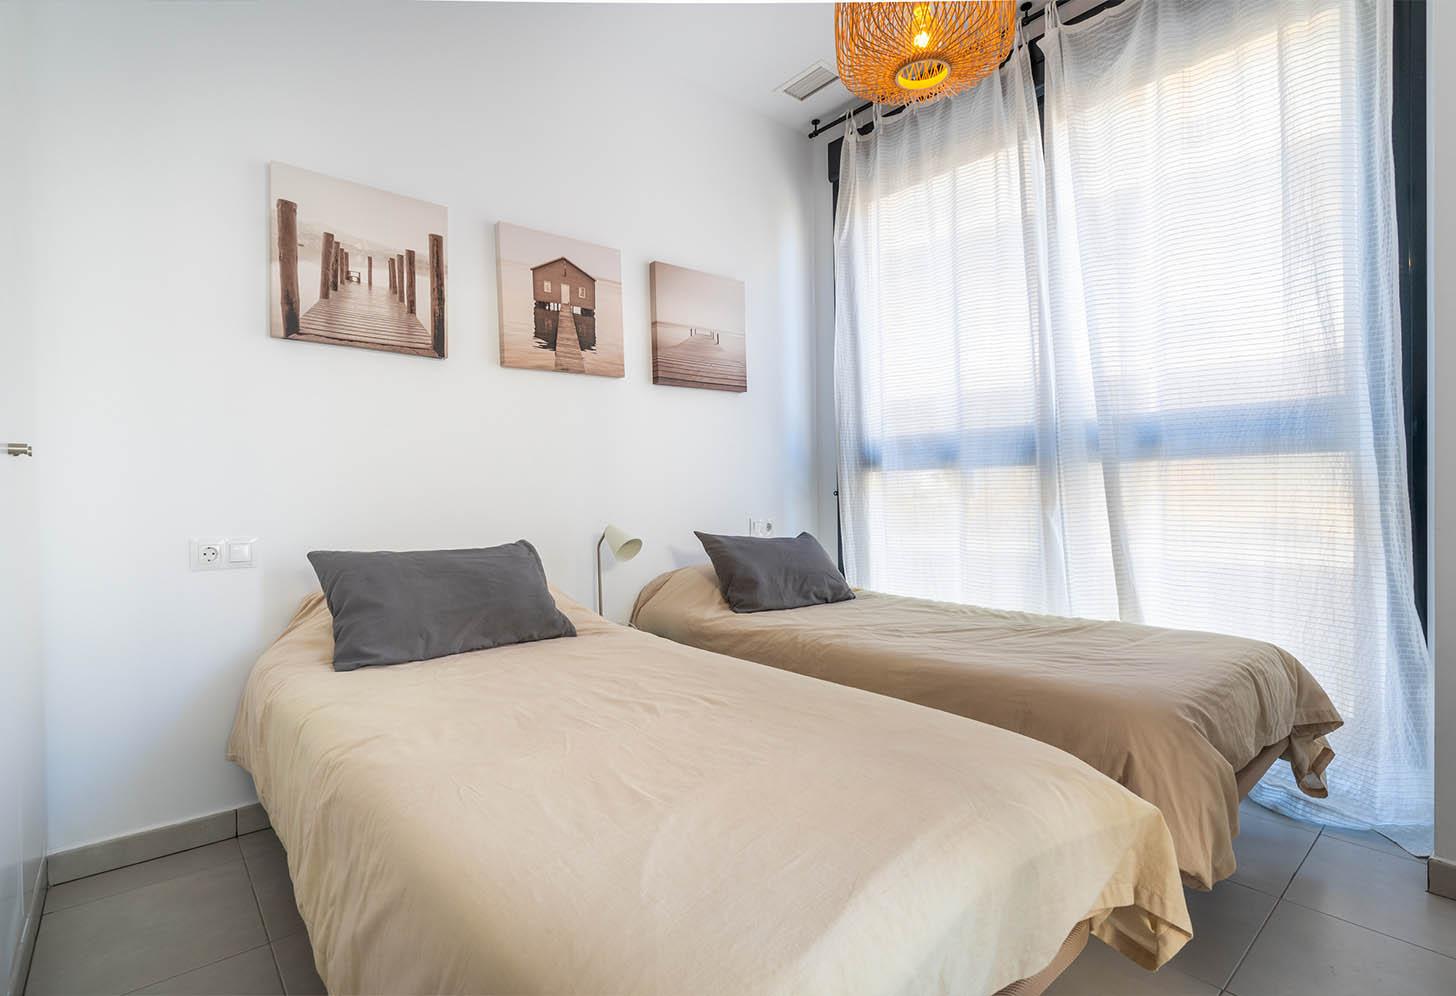 immobilier neuf espagne costa blanca on-m1 calpe beach II chambre 1